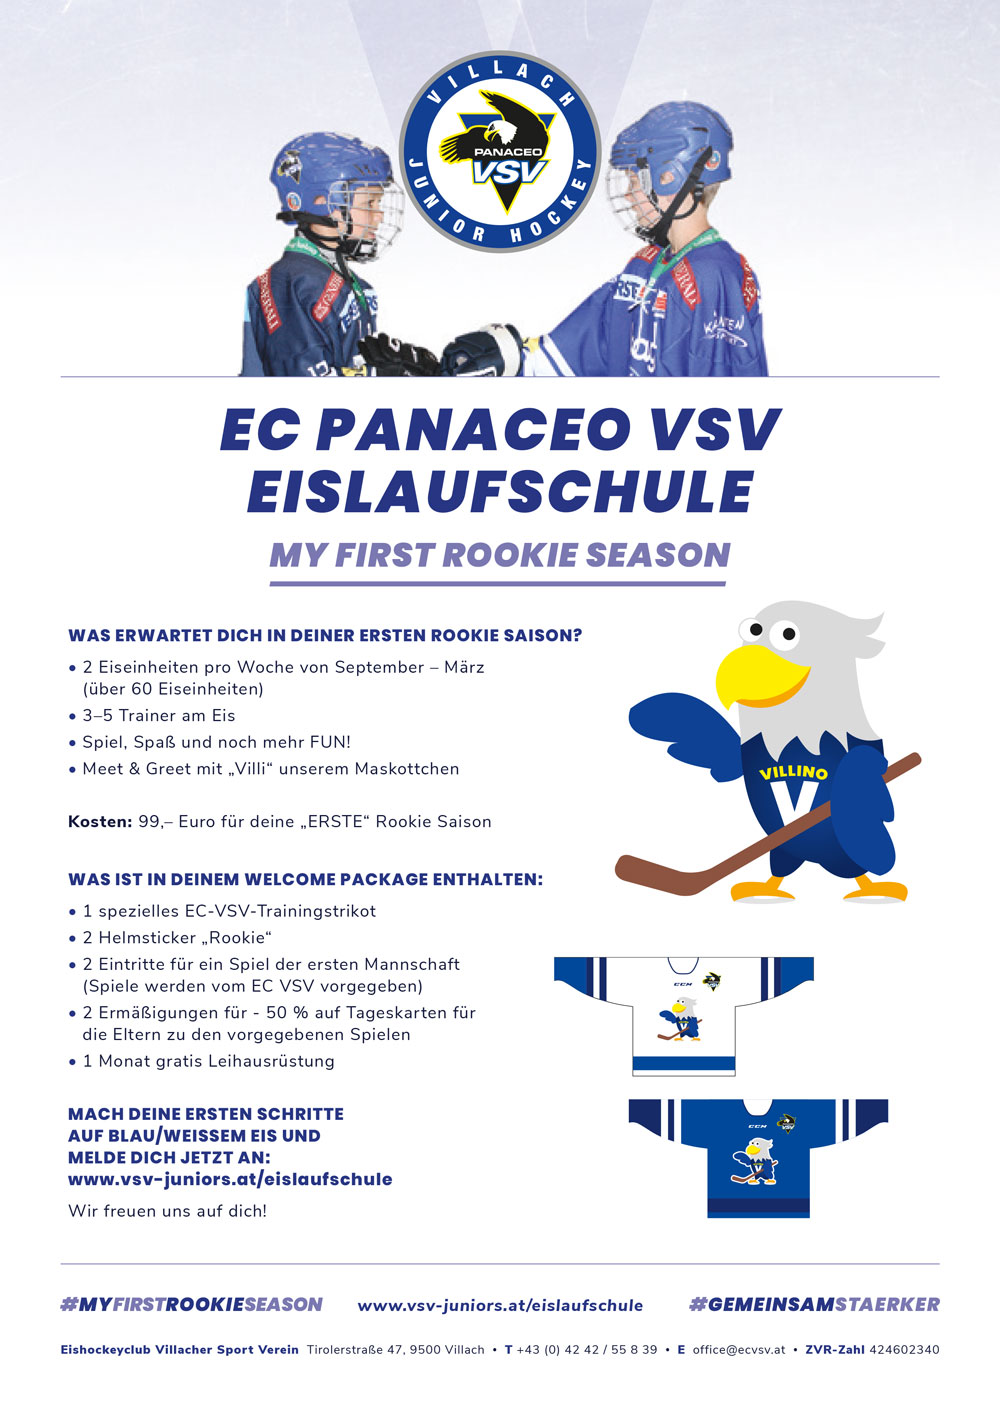 EC Panaceo VSV Eislaufschule